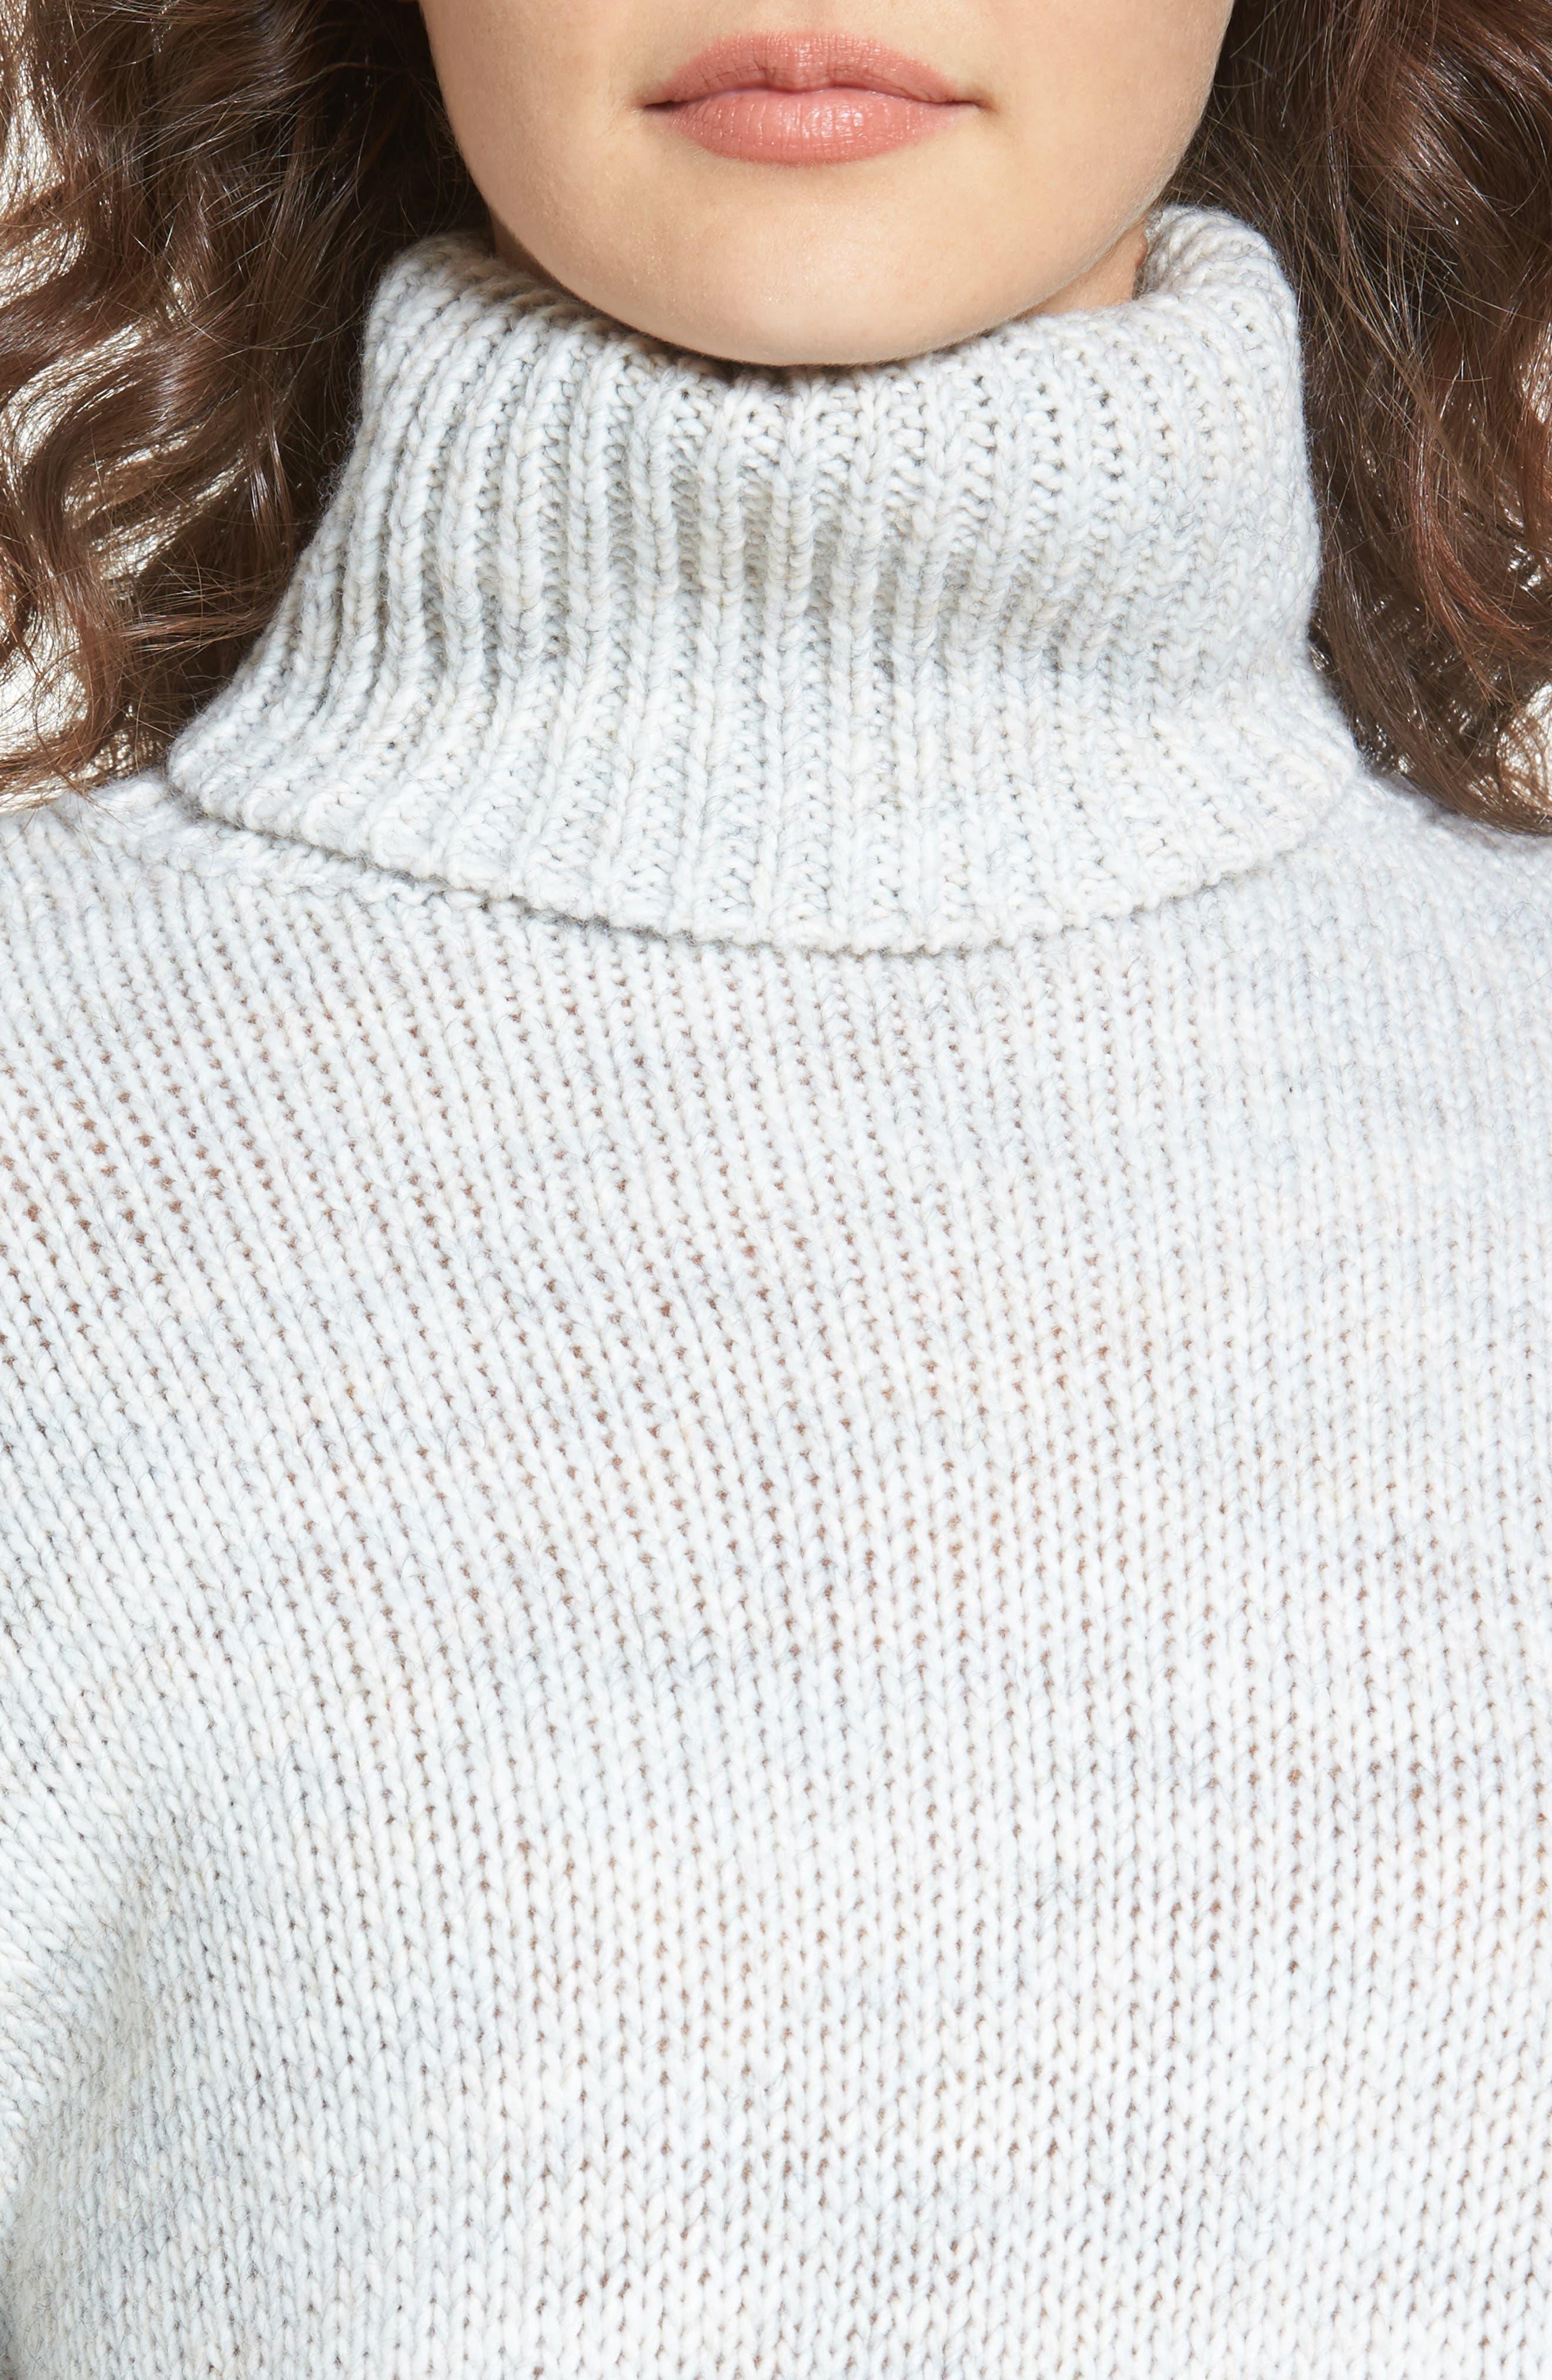 Skelter Turtleneck Sweater,                             Alternate thumbnail 4, color,                             Heather Grey